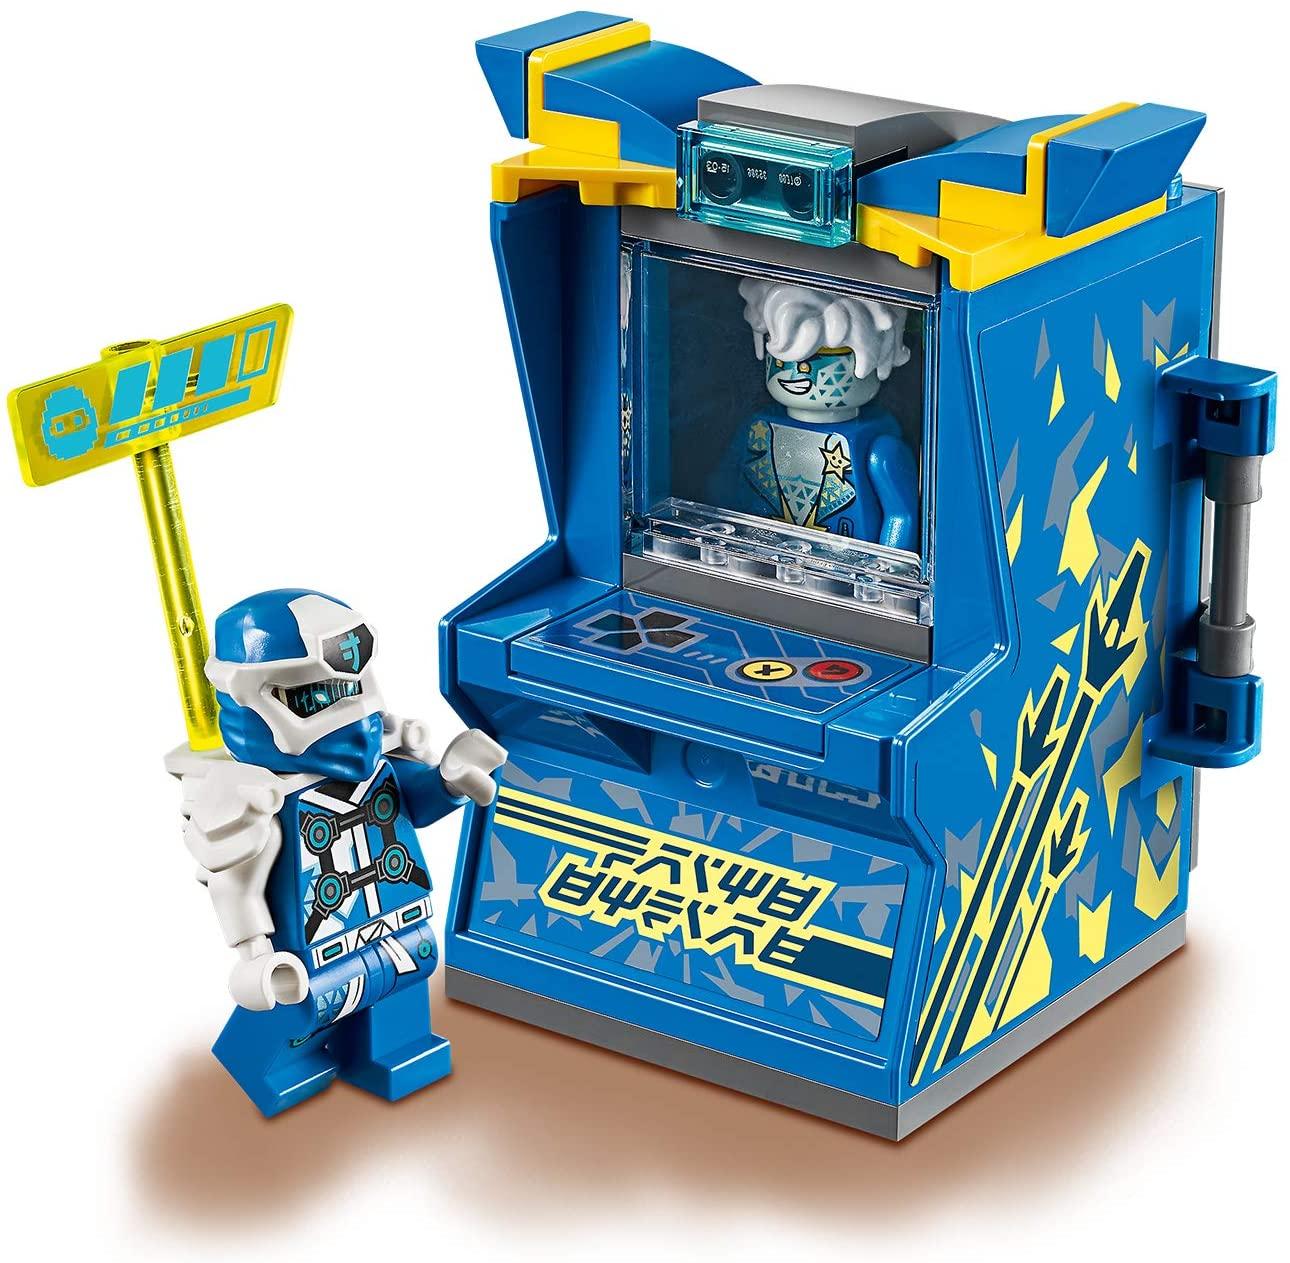 NINJAGO Avatar (Jay, Lloyd & Kai) Tragbare Arcade Kapsel, Ninja-Spielzeug für je 6,99€ (Amazon Prime & Müller Abholung)